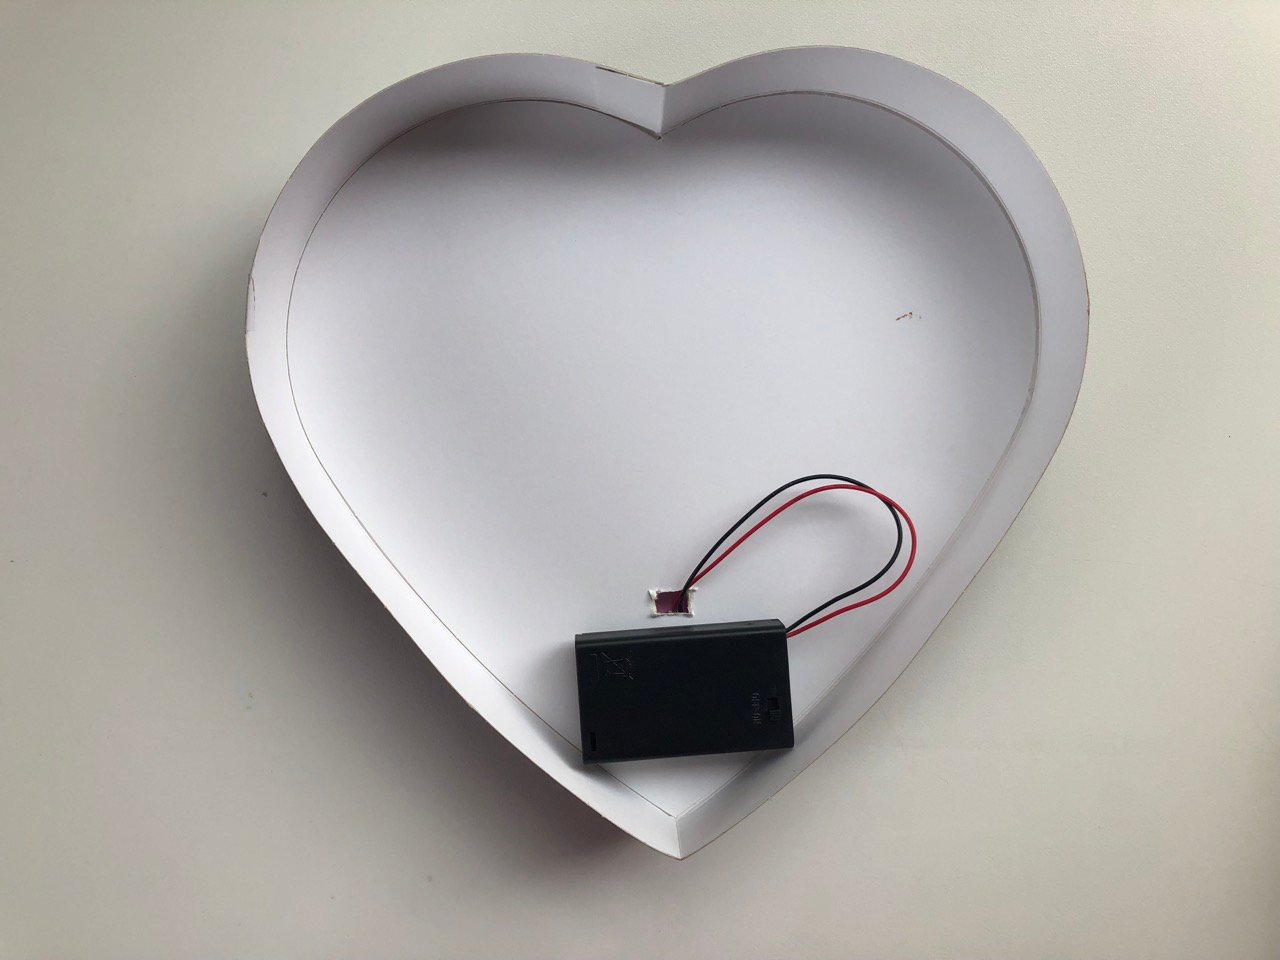 makecode_05_batterybox.jpg